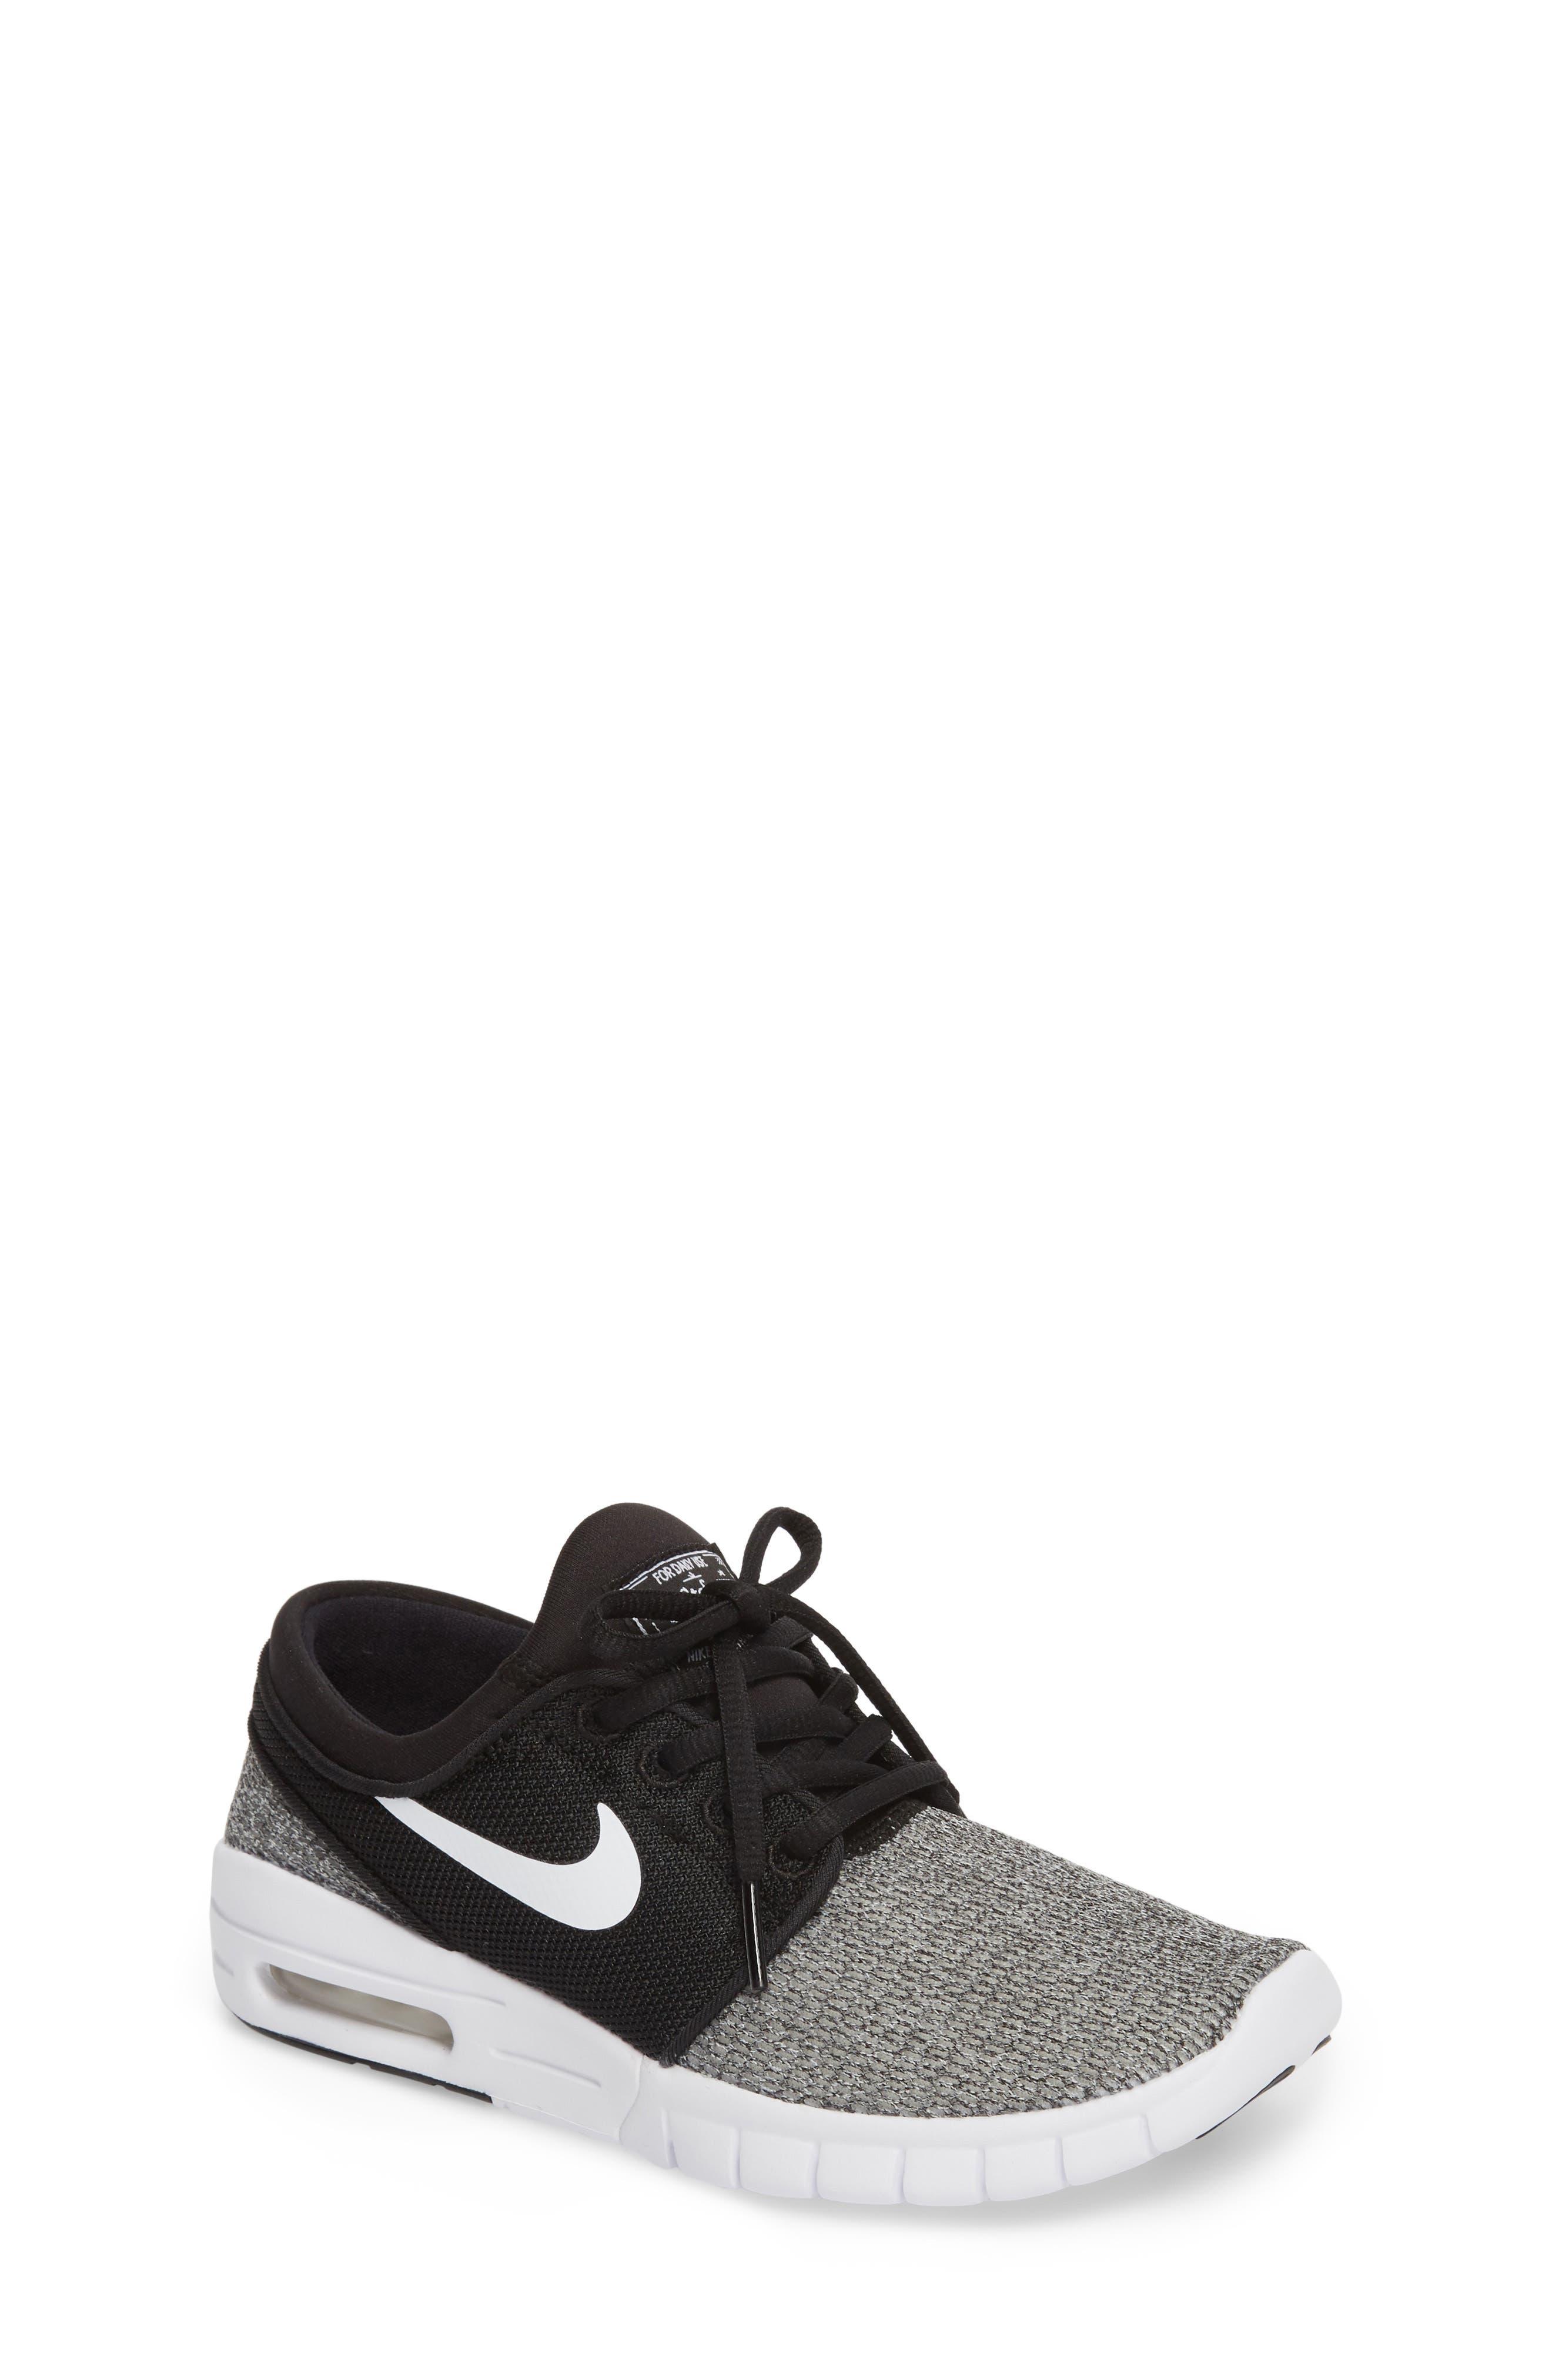 Stefan Janoski Max SB Skate Sneaker,                         Main,                         color, Black/ White/ White